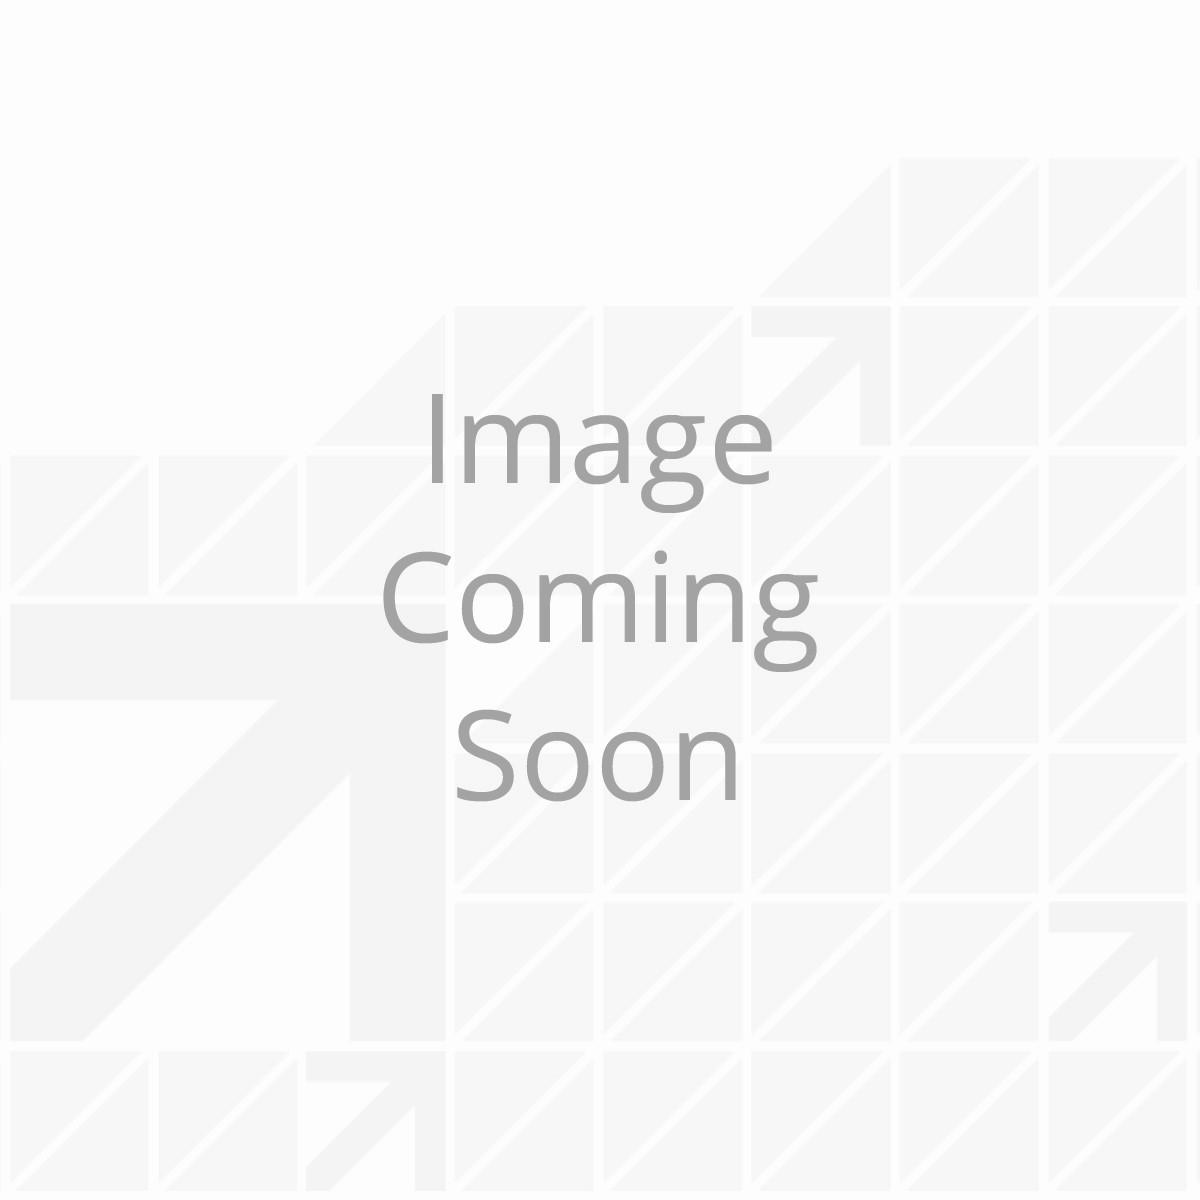 rv electric stabilizer jack manual crank handle rh store lci1 com lippert electric stabilizer jacks installation manual Lippert Stabilizer Jack Switch